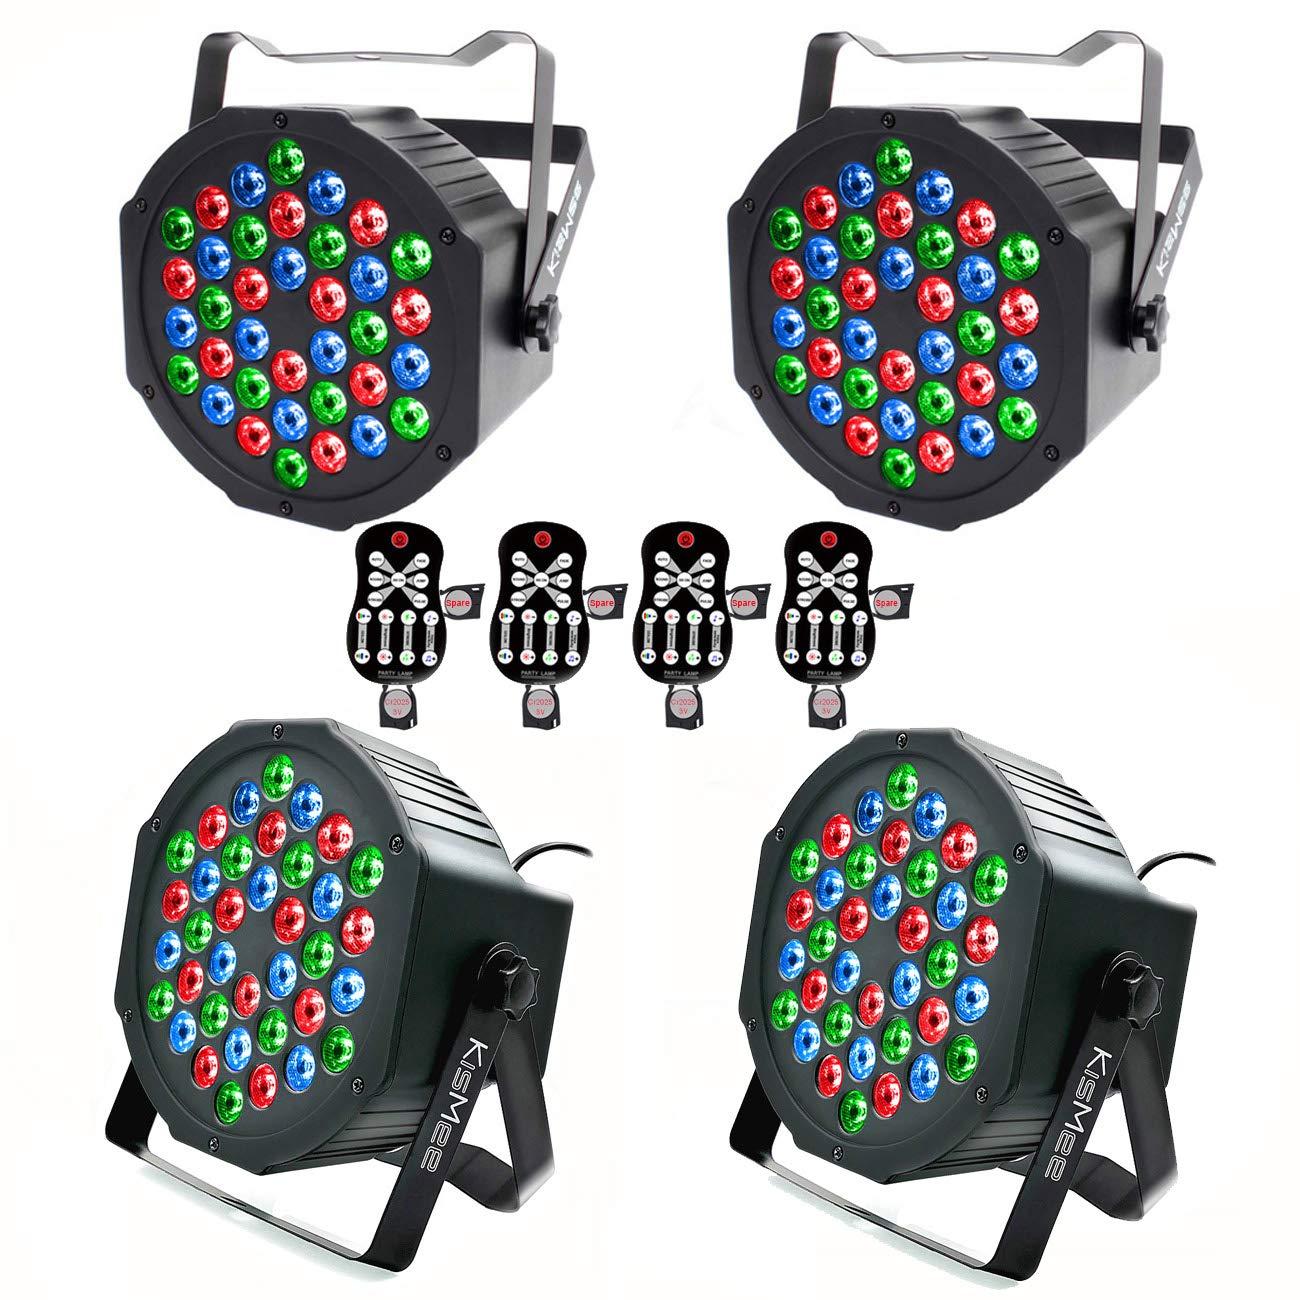 Stage Lights KisMee 36 LEDs RGB Sound Activated DJ Par Lights with Remote Control Compatible with DMX, Various Modes LED Up Lights for Wedding Event Party Festival (36LEDs Par Lights 4 Sets) by KisMee